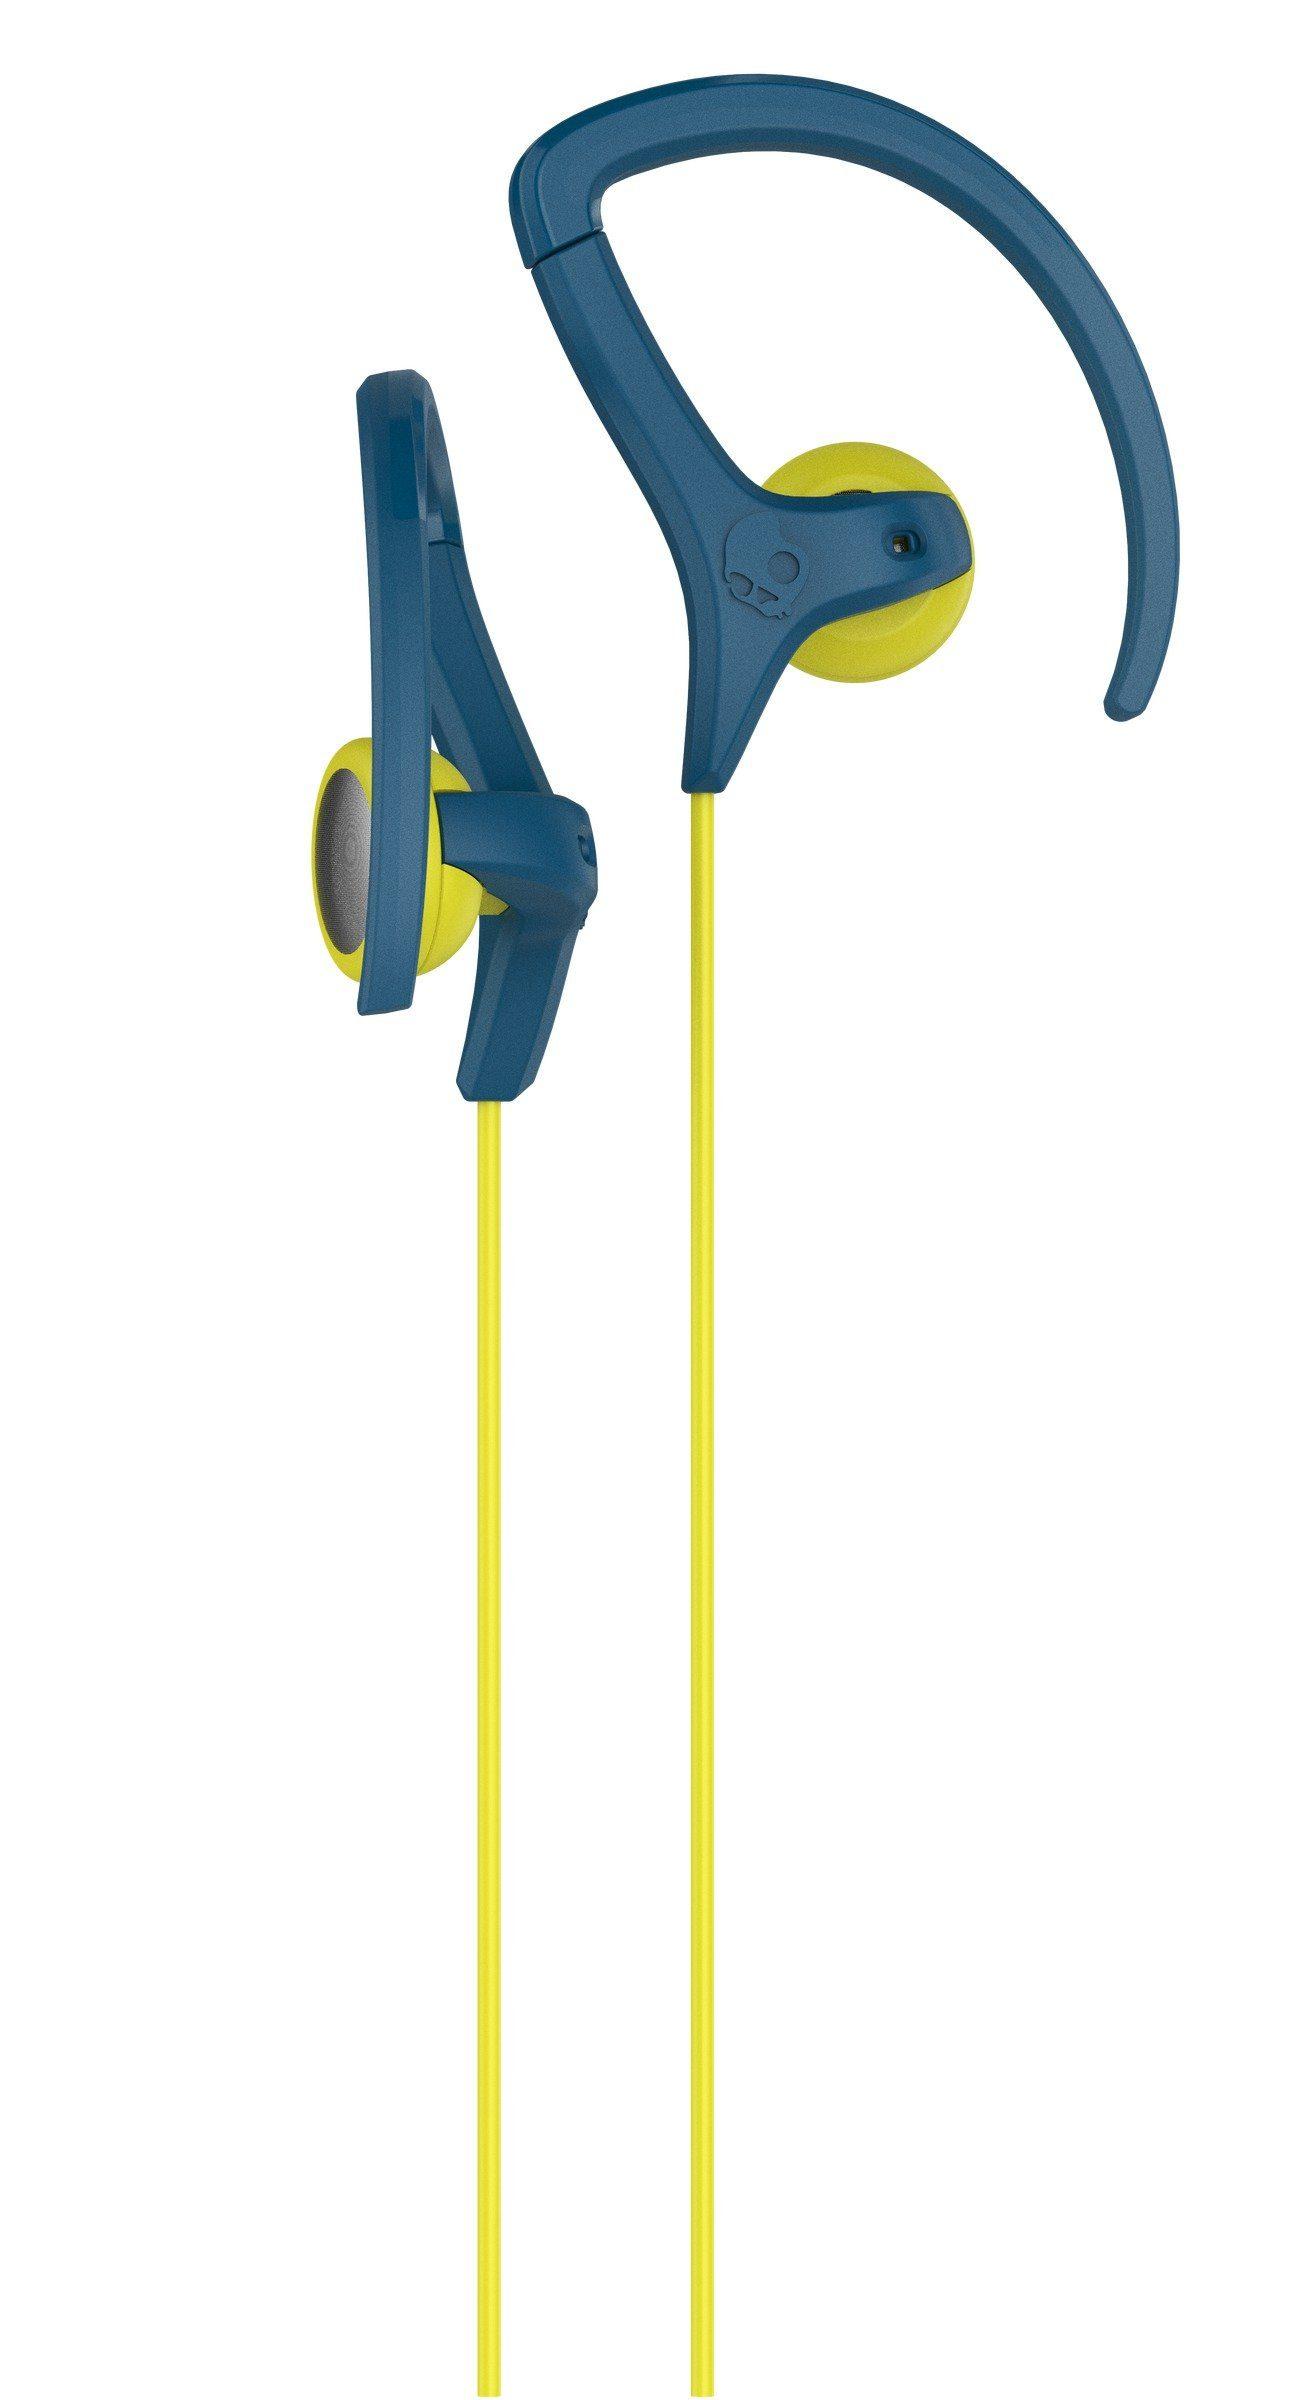 Skullcandy Kopfhörer »Chops TEAL/ACID/ACID«